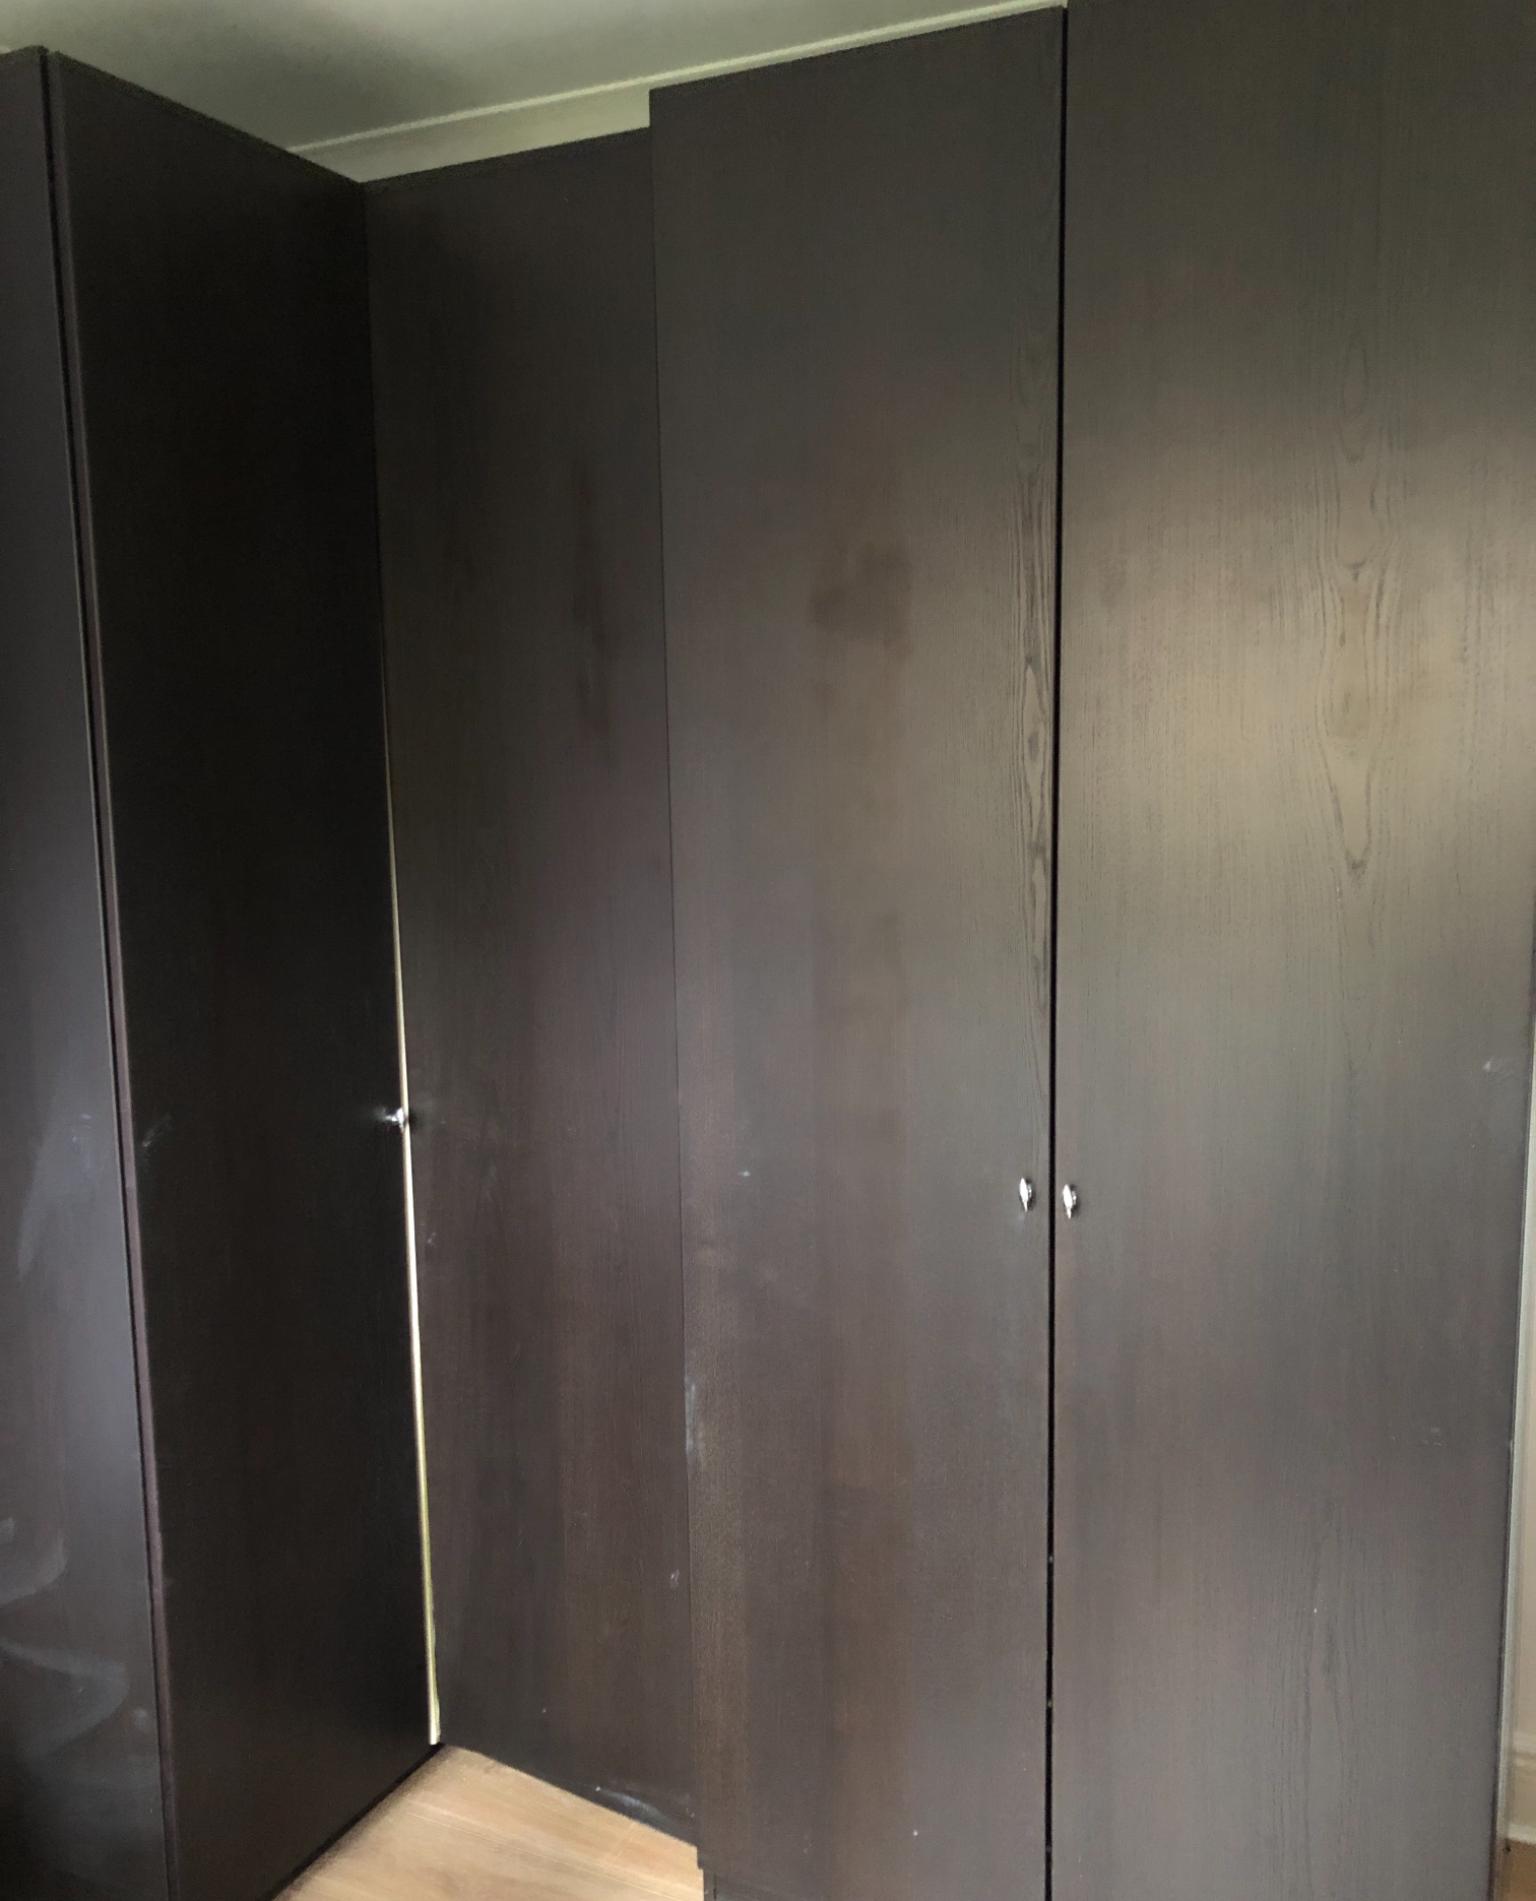 Two IKEA PAX wardrobes